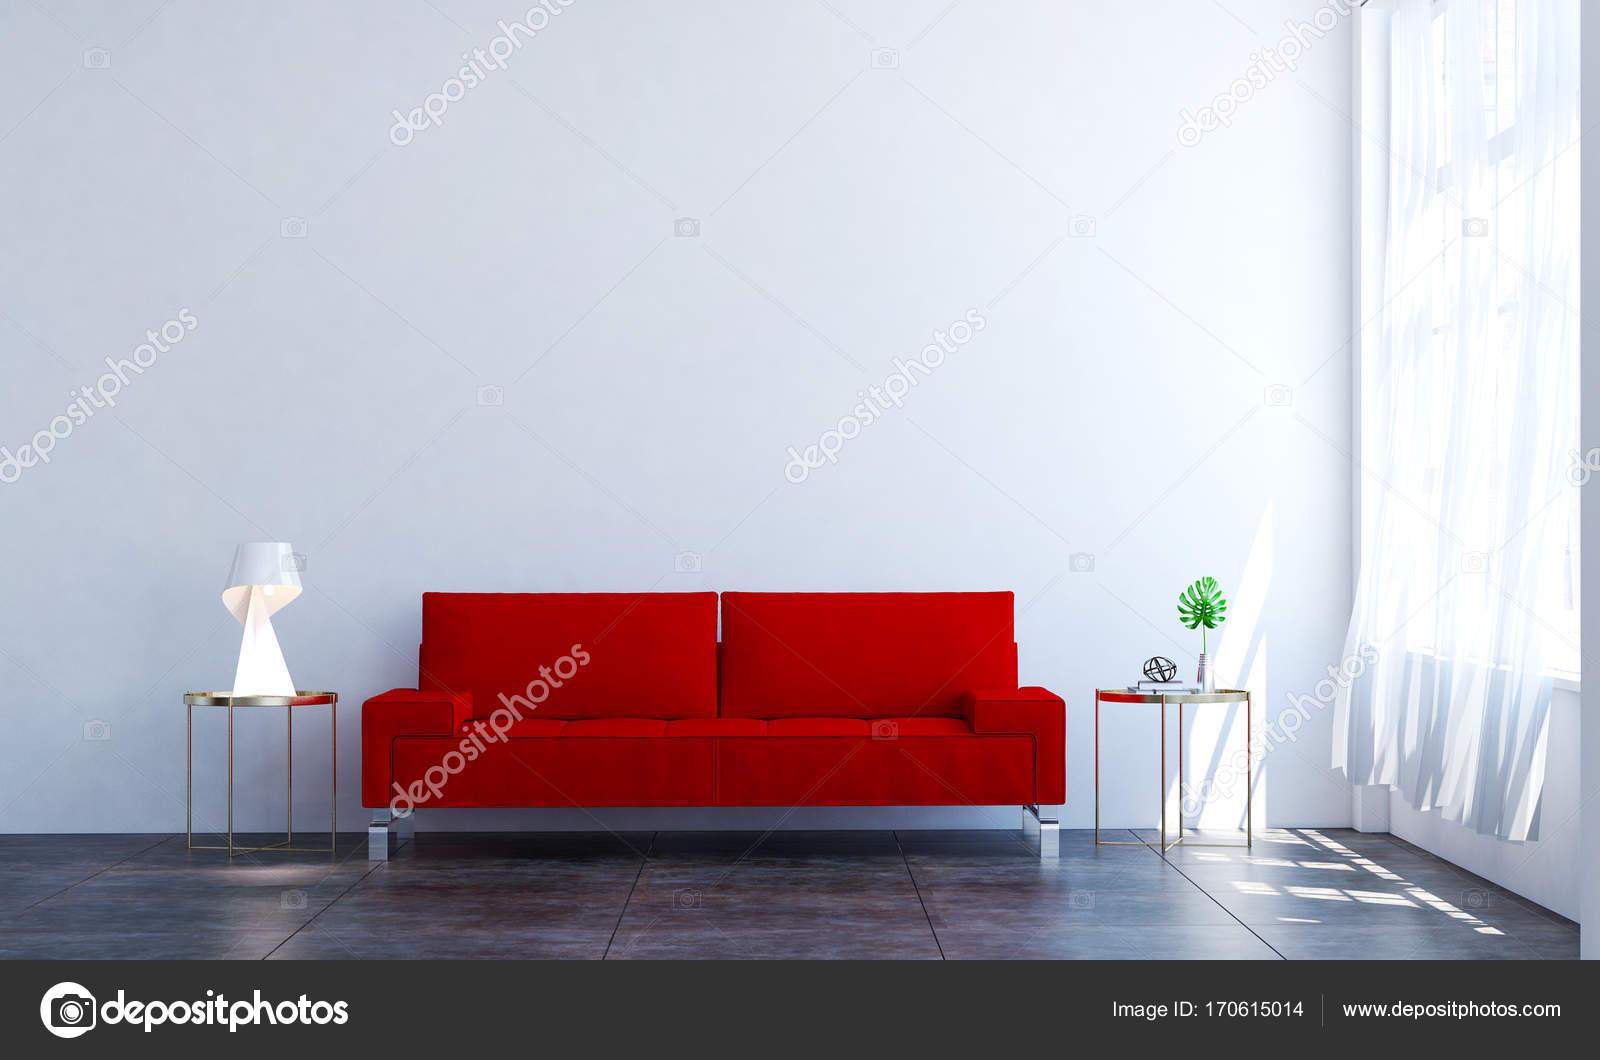 Het interieur design idee van minimale rode sofa en woonkamer en wit